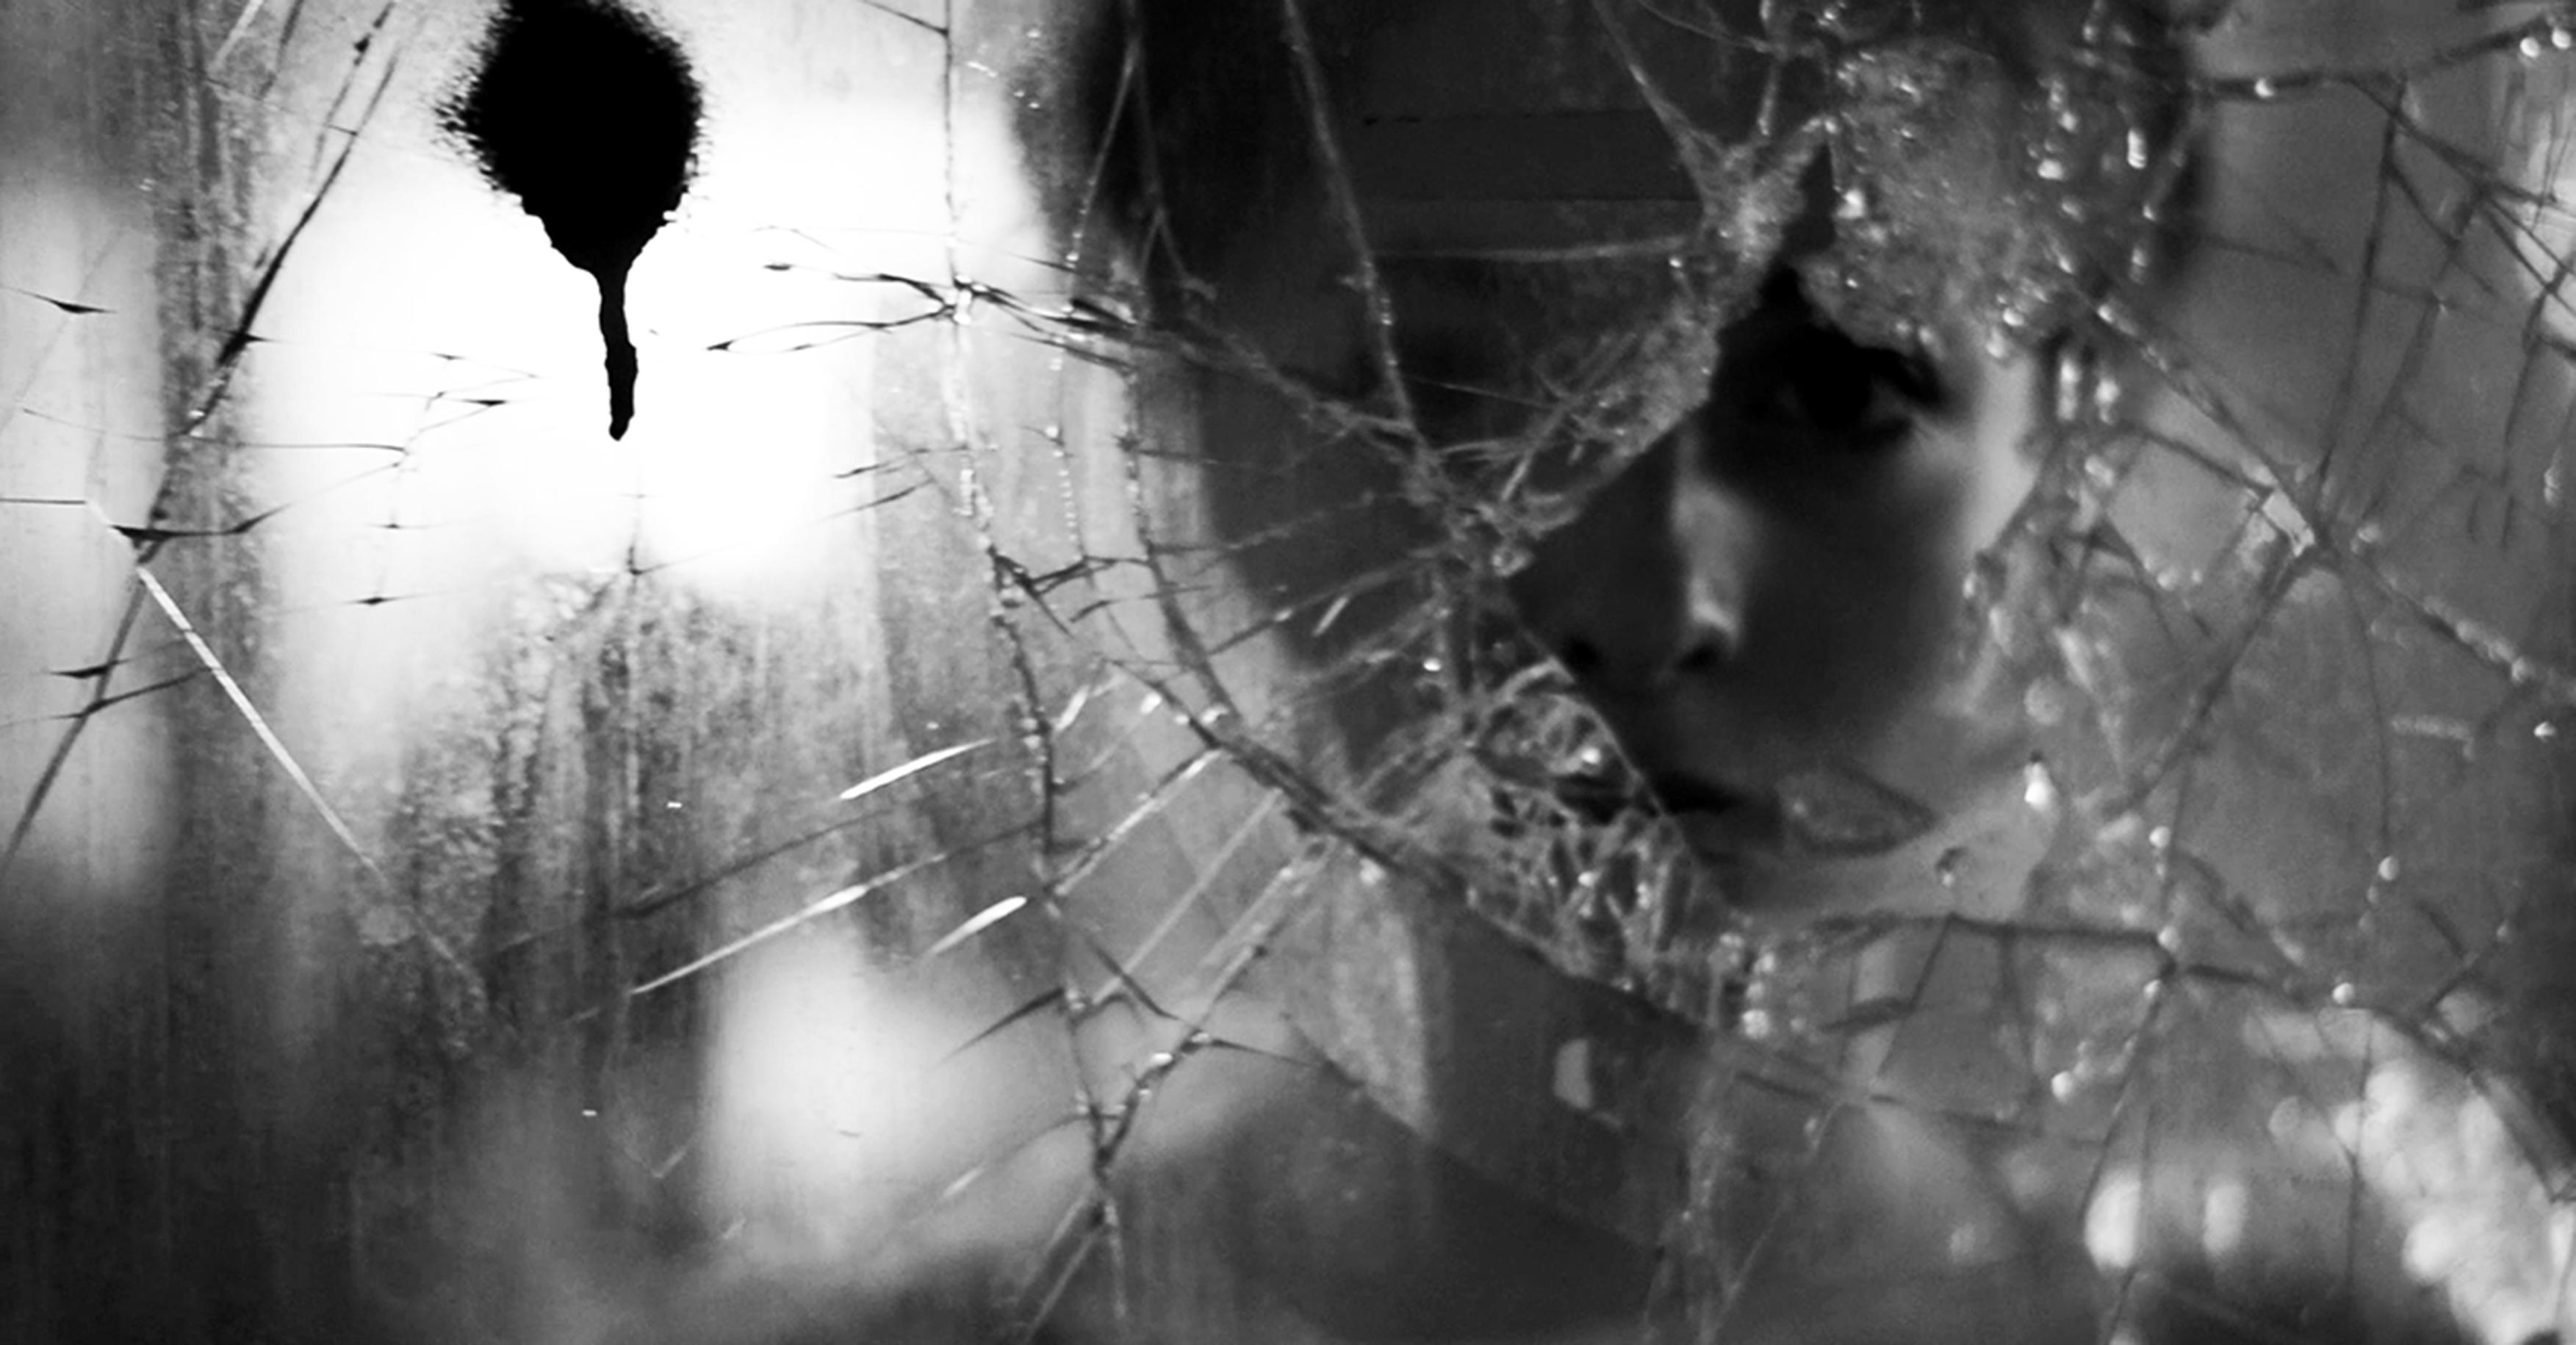 Immagine tratta dal video arte 'Frontal Lobotomy' di Helmut Morganti